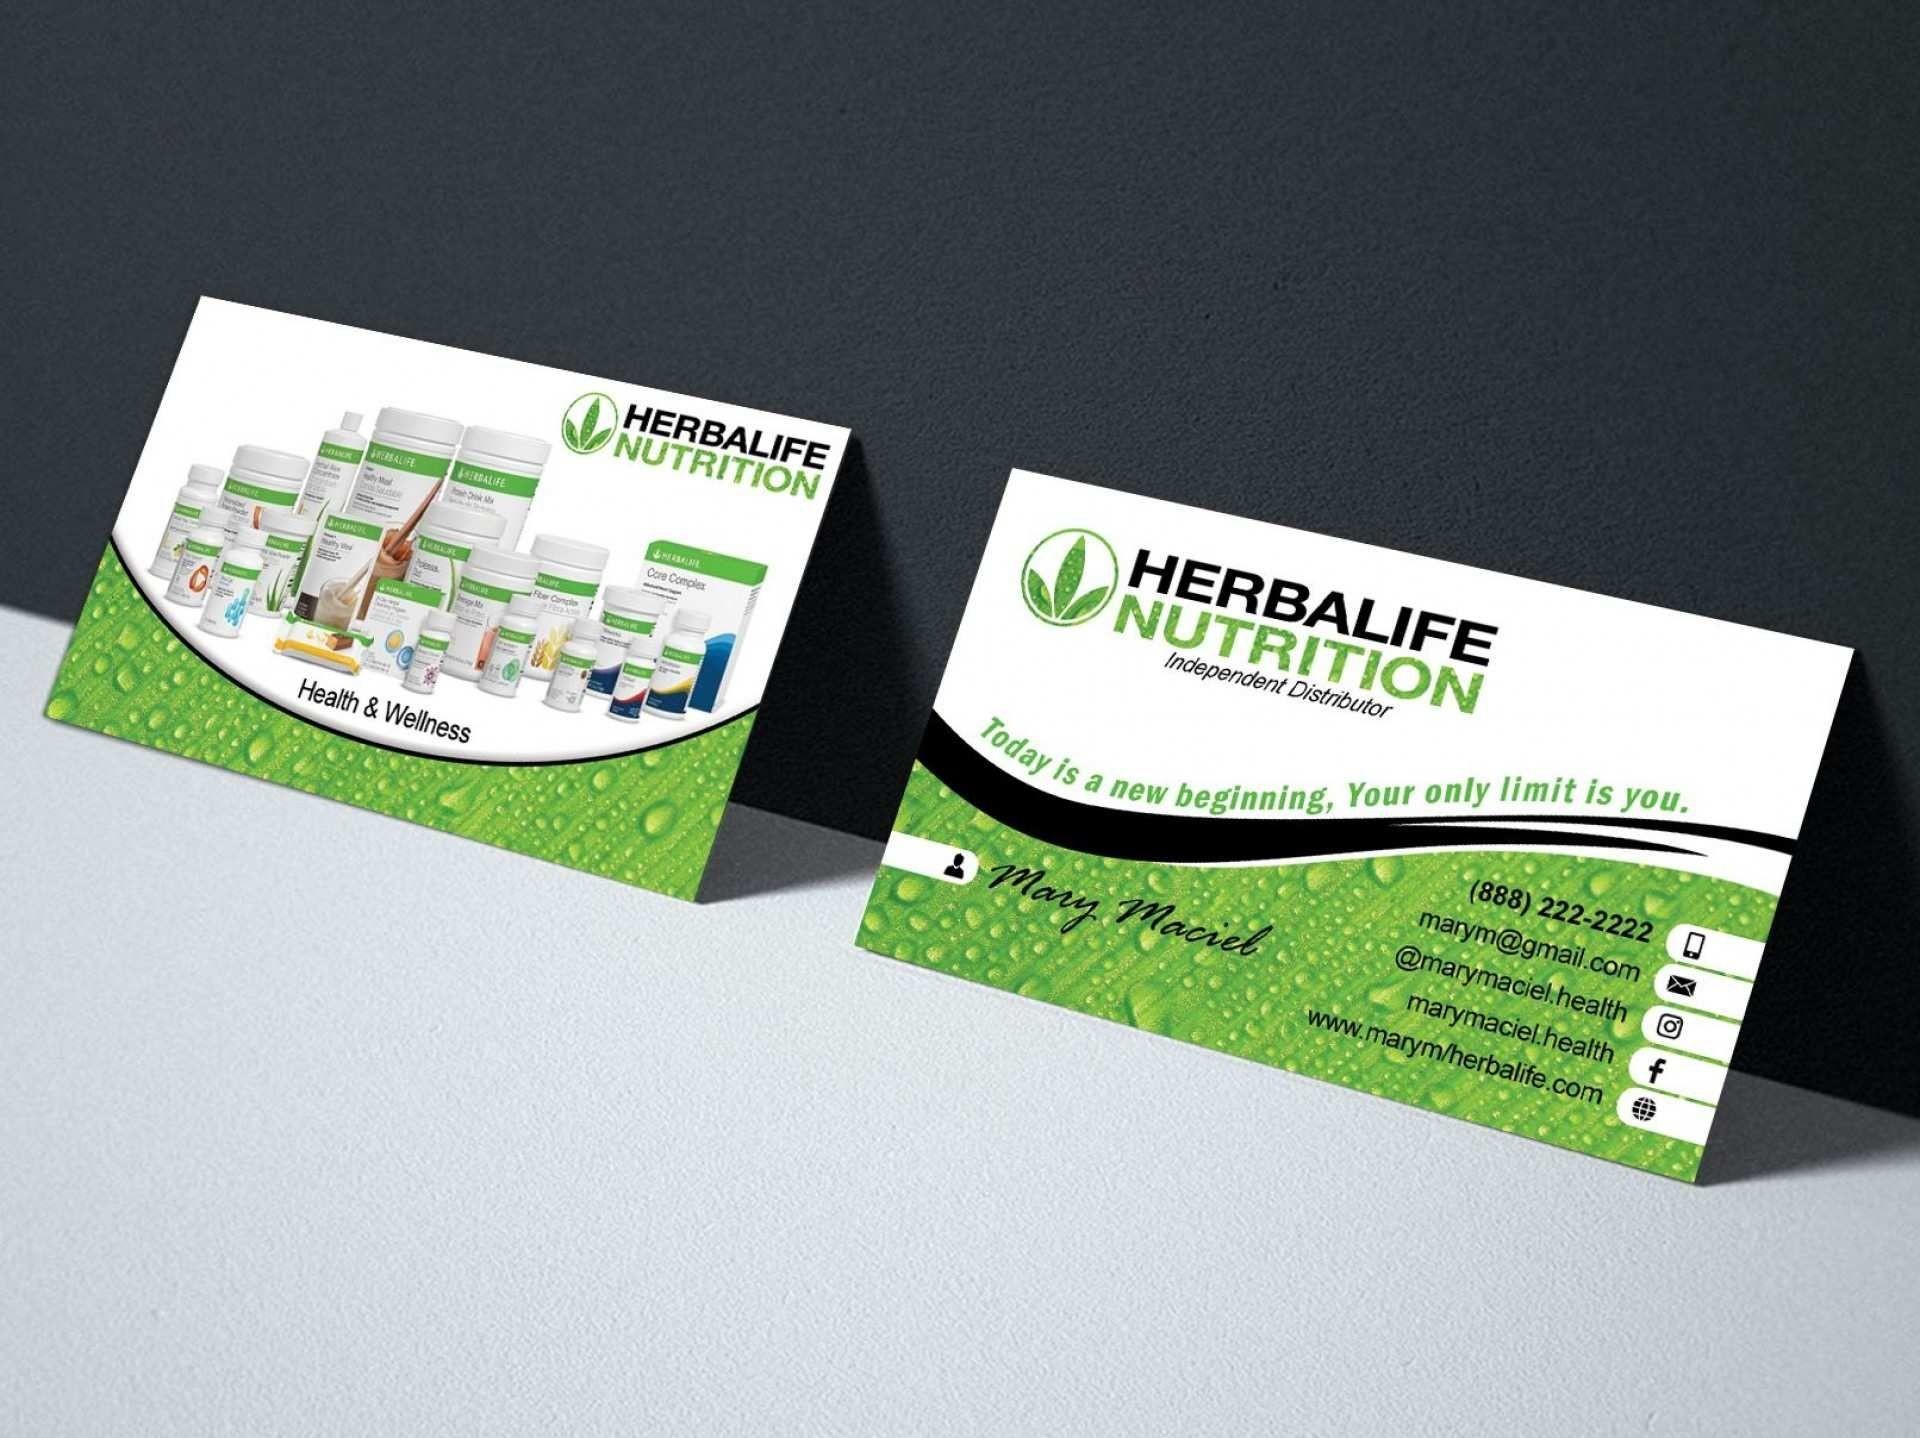 003 Beautiful Herbalife Busines Card Template Example  Download Free1920